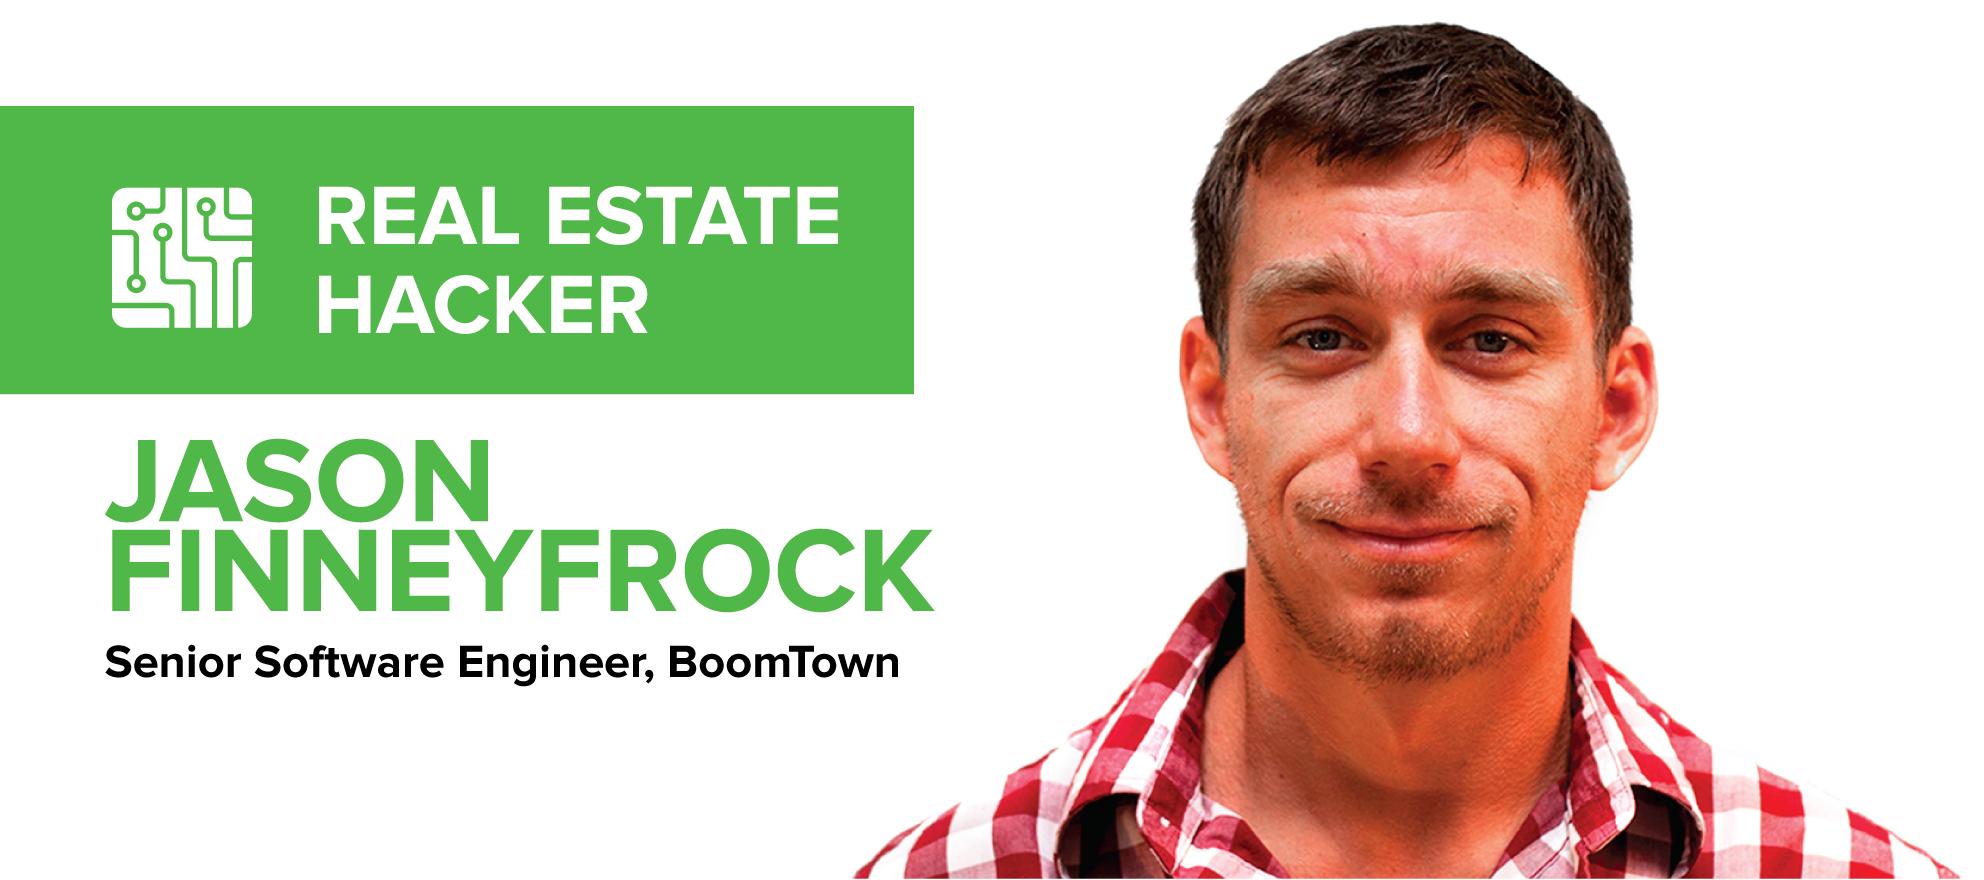 Massaging the pain points: Jason Finneyfrock, real estate hacker